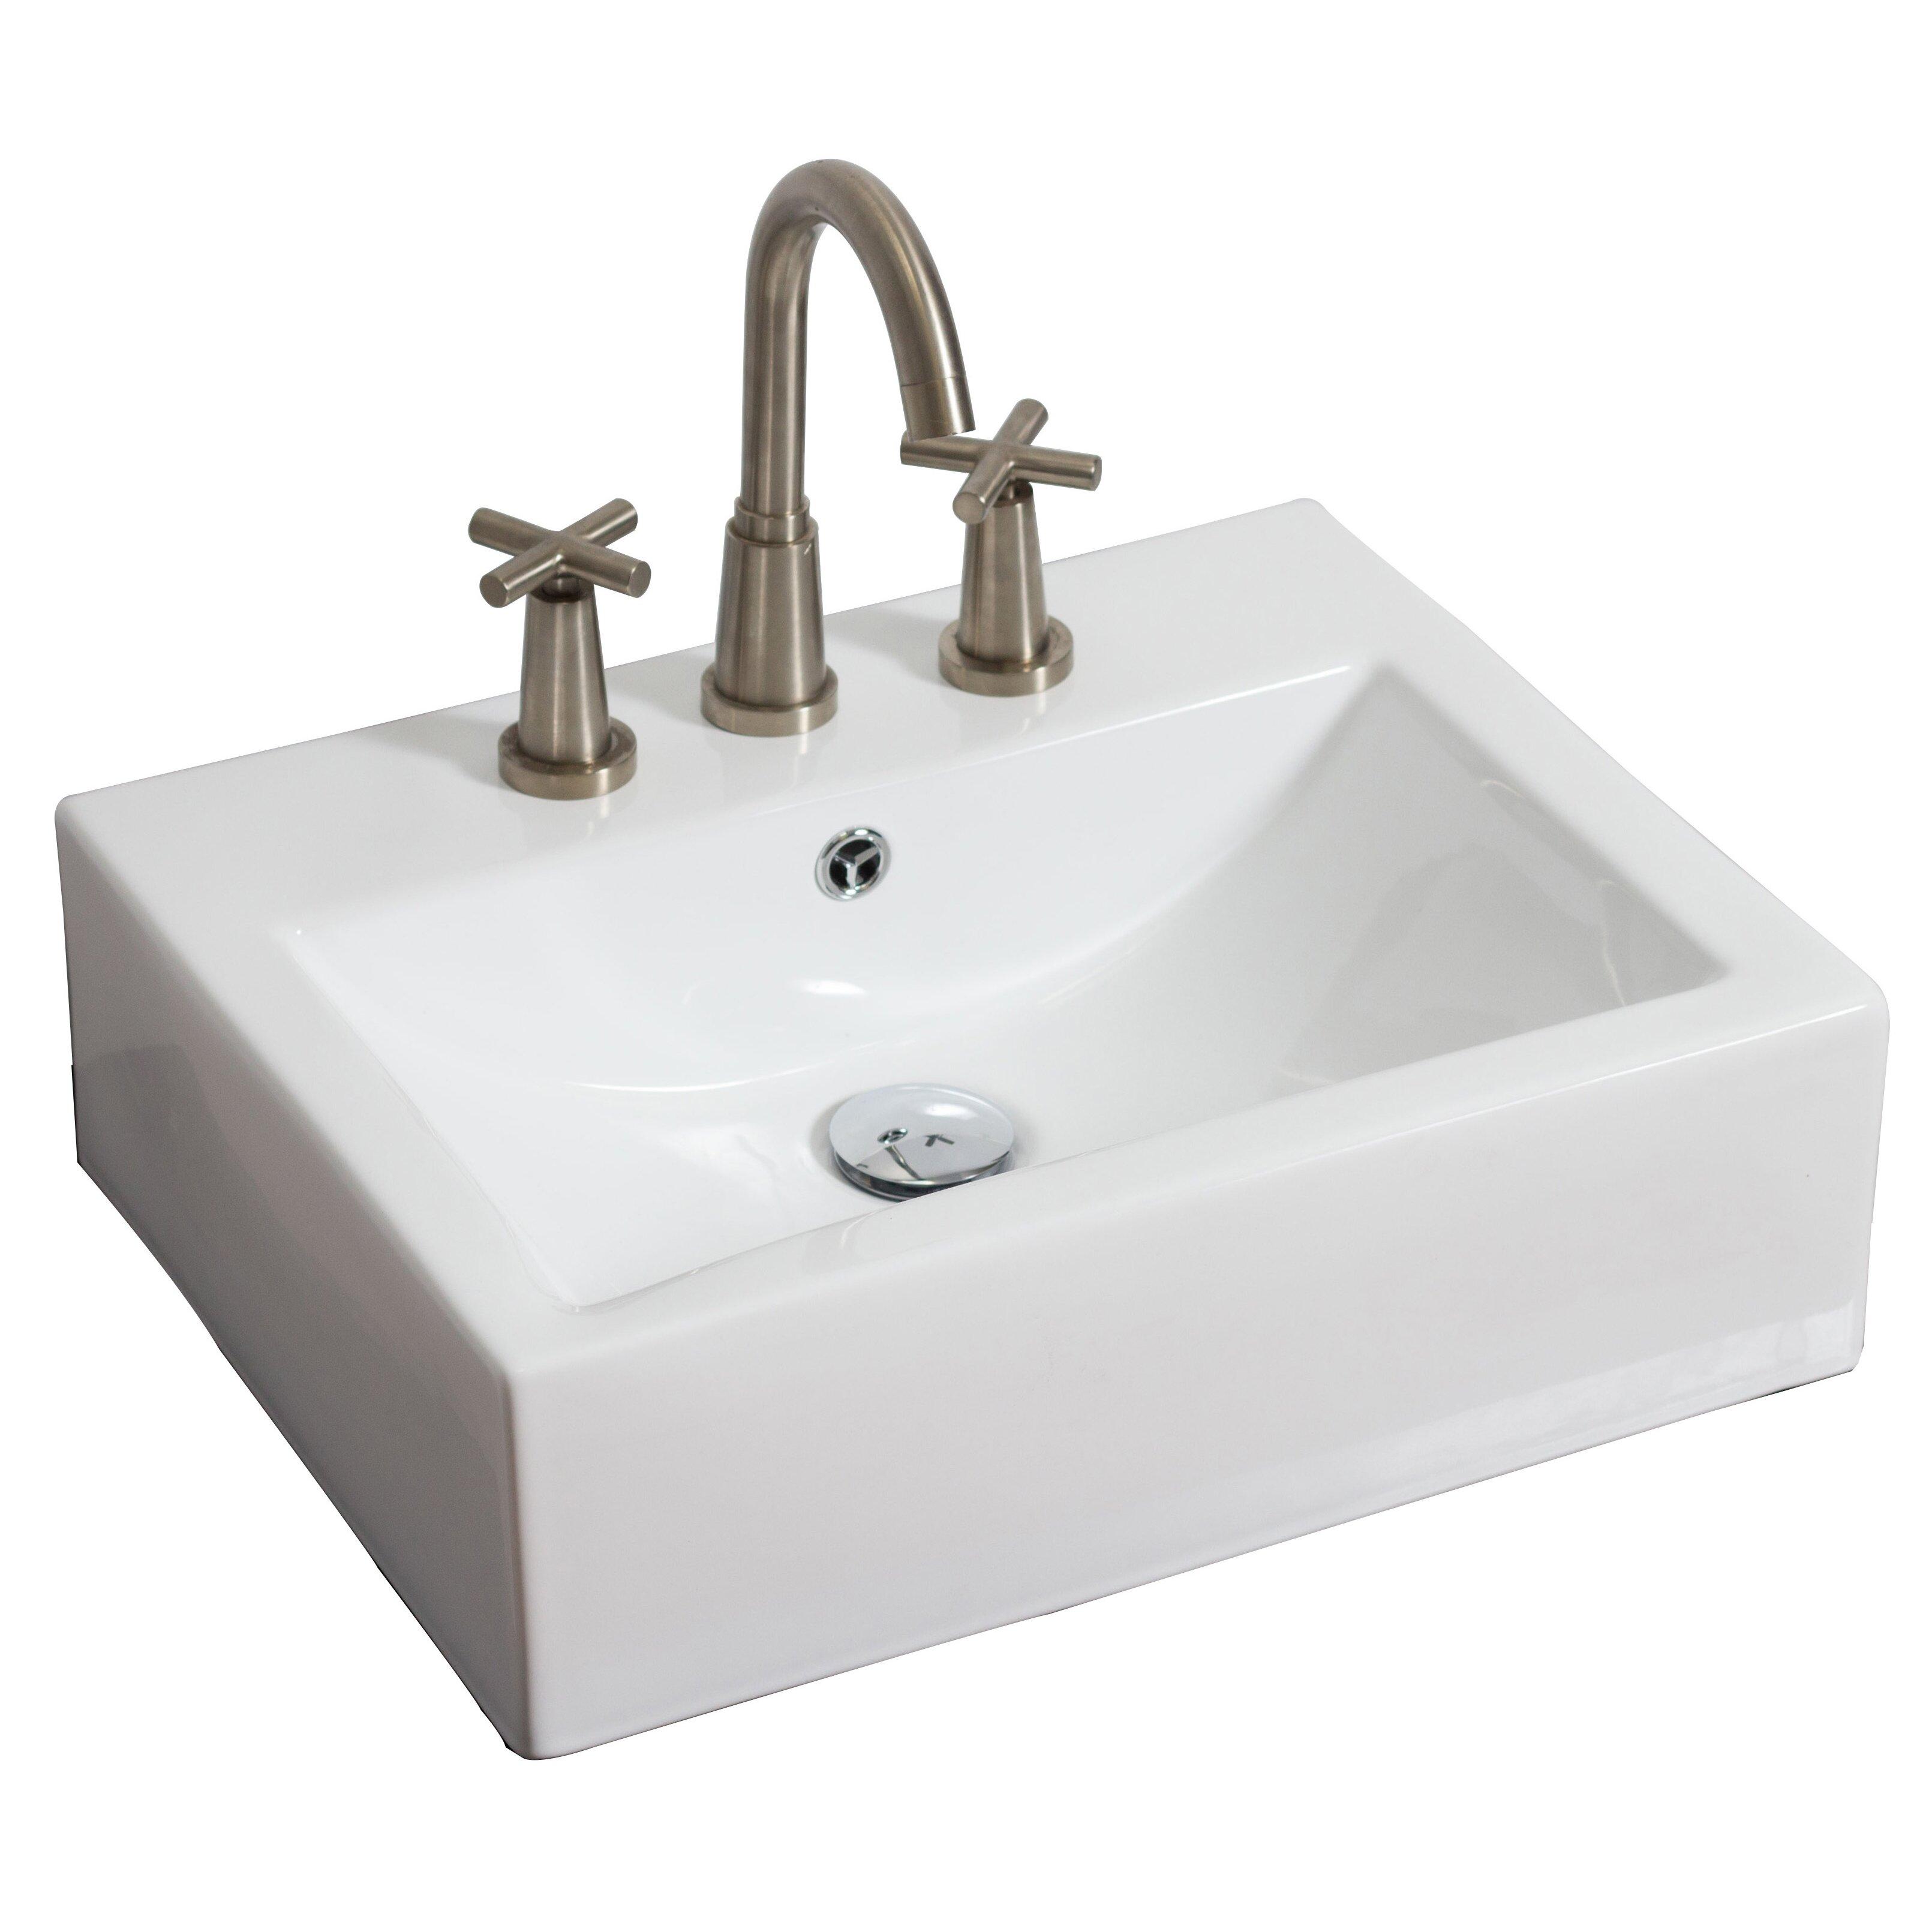 Wall mounted rectangle vessel bathroom sink - Rectangular vessel bathroom sinks ...